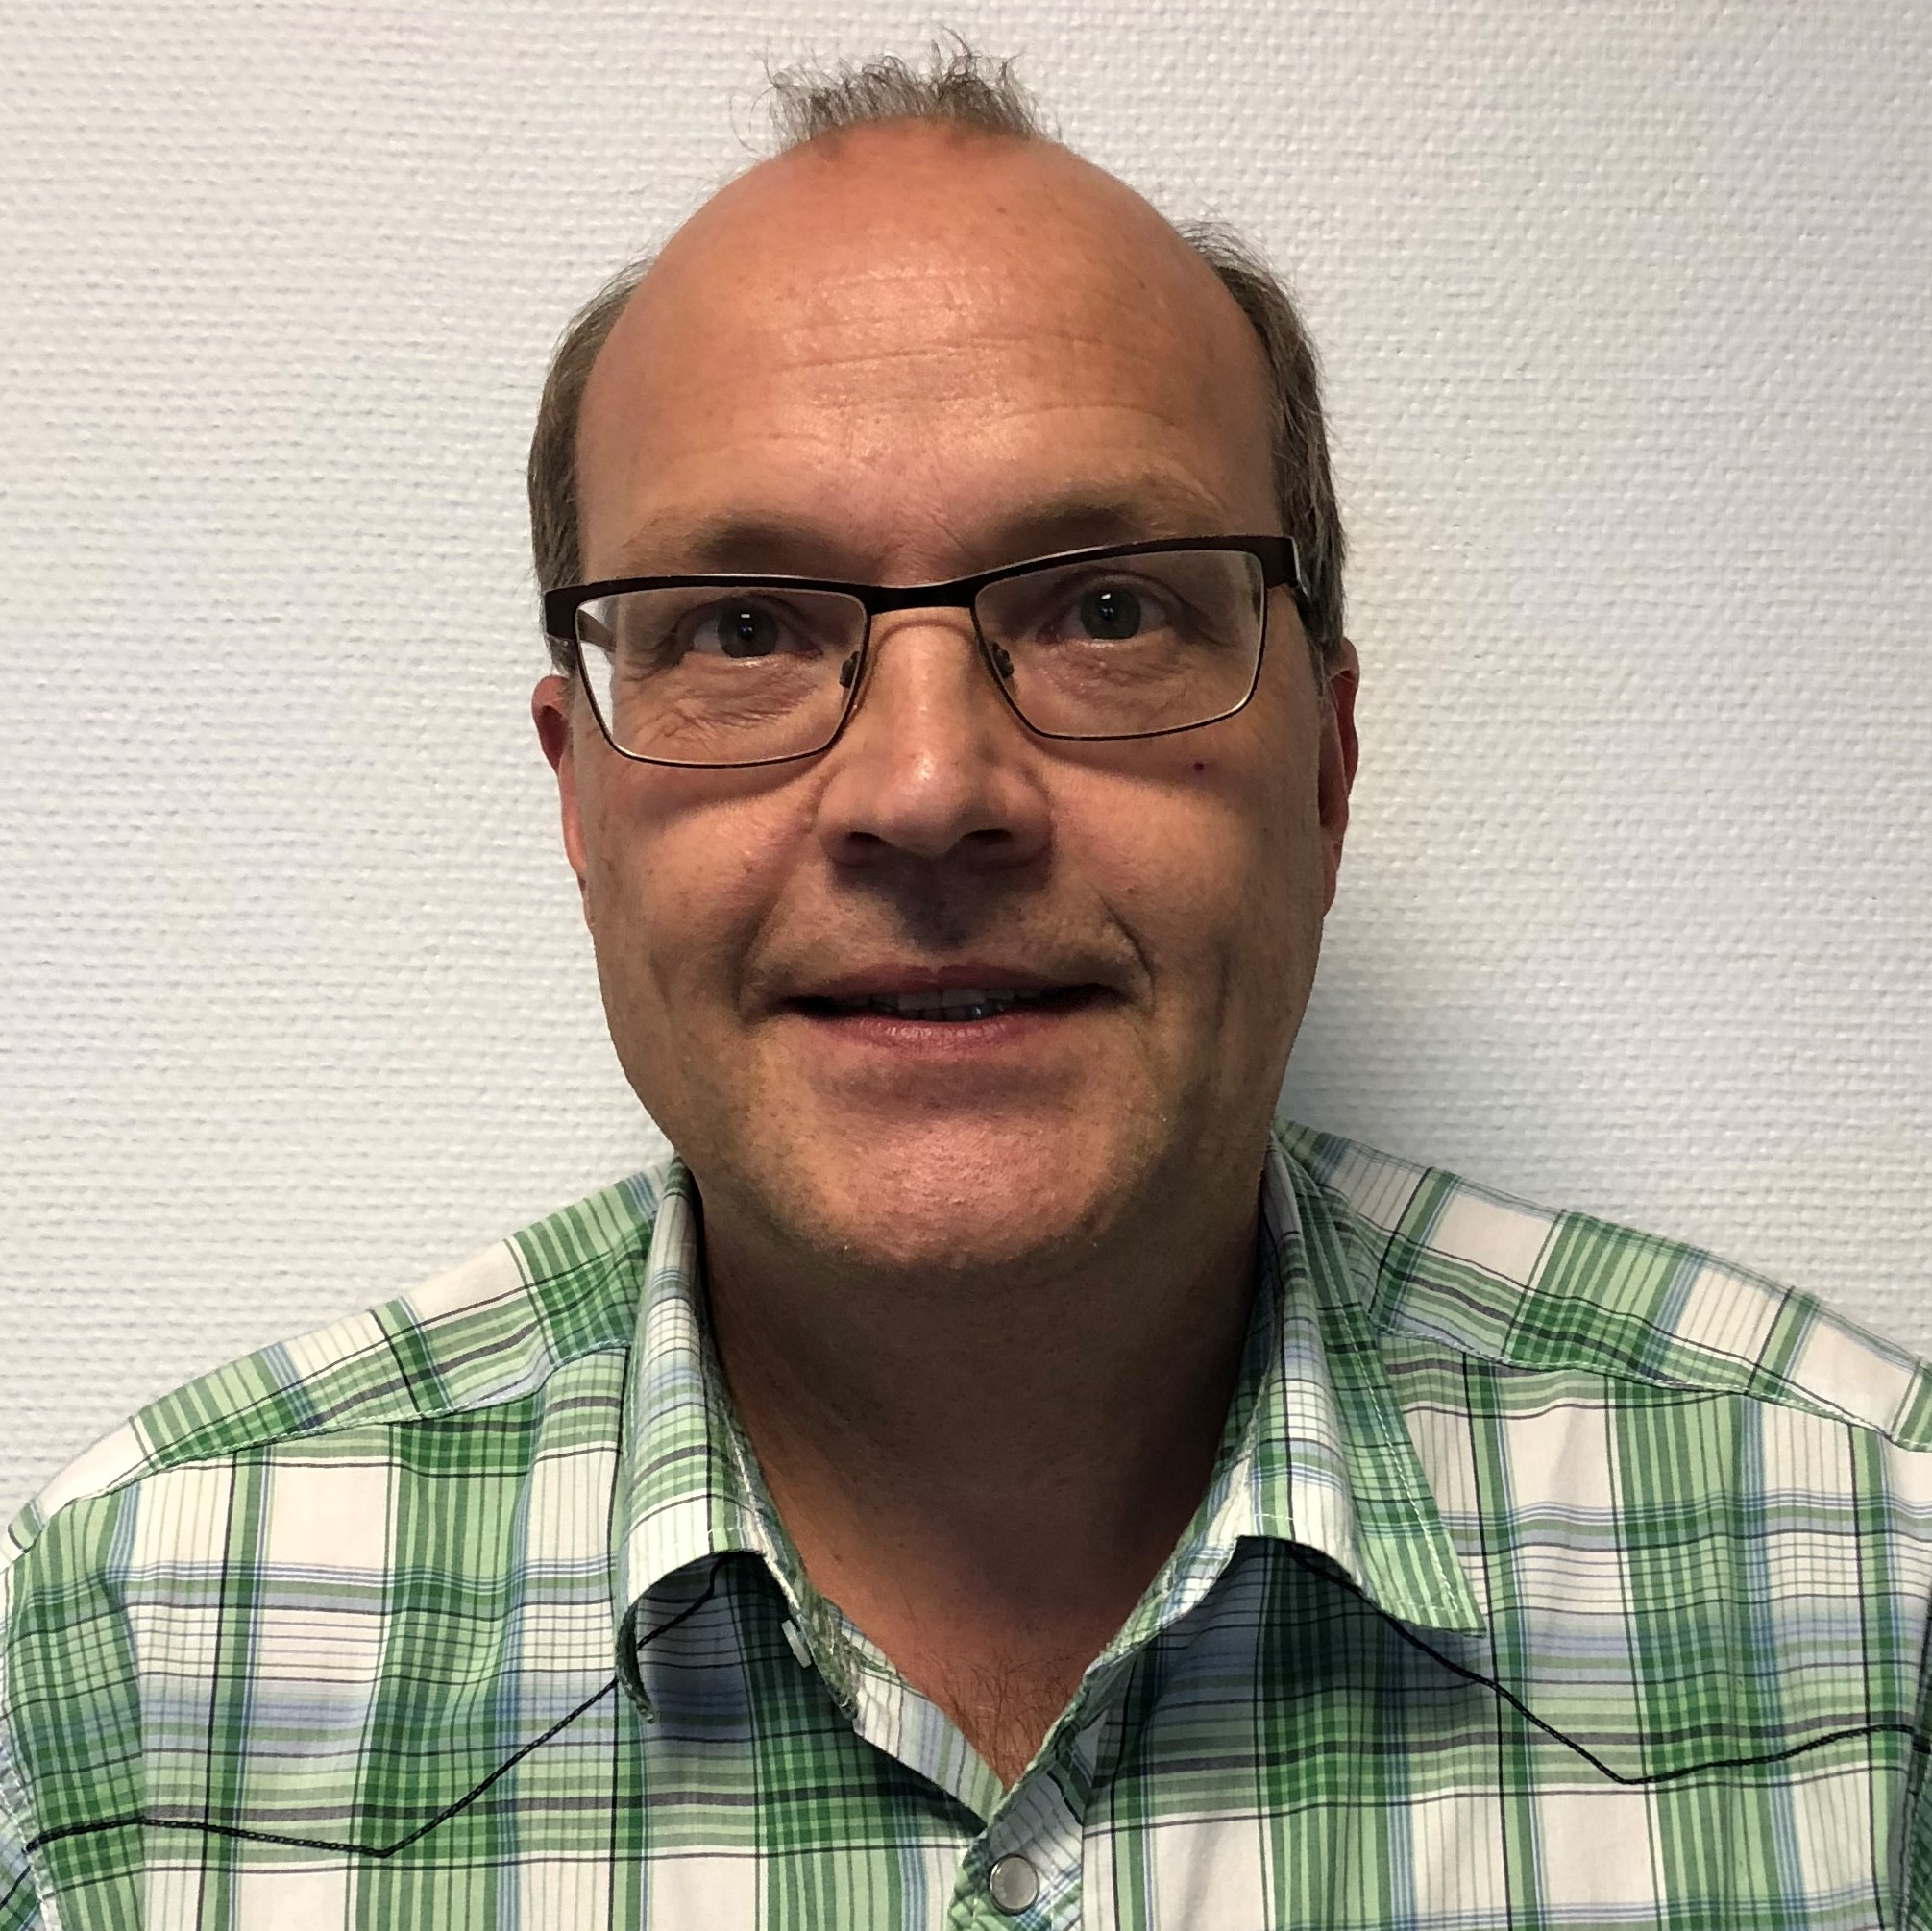 Håkan Kindström